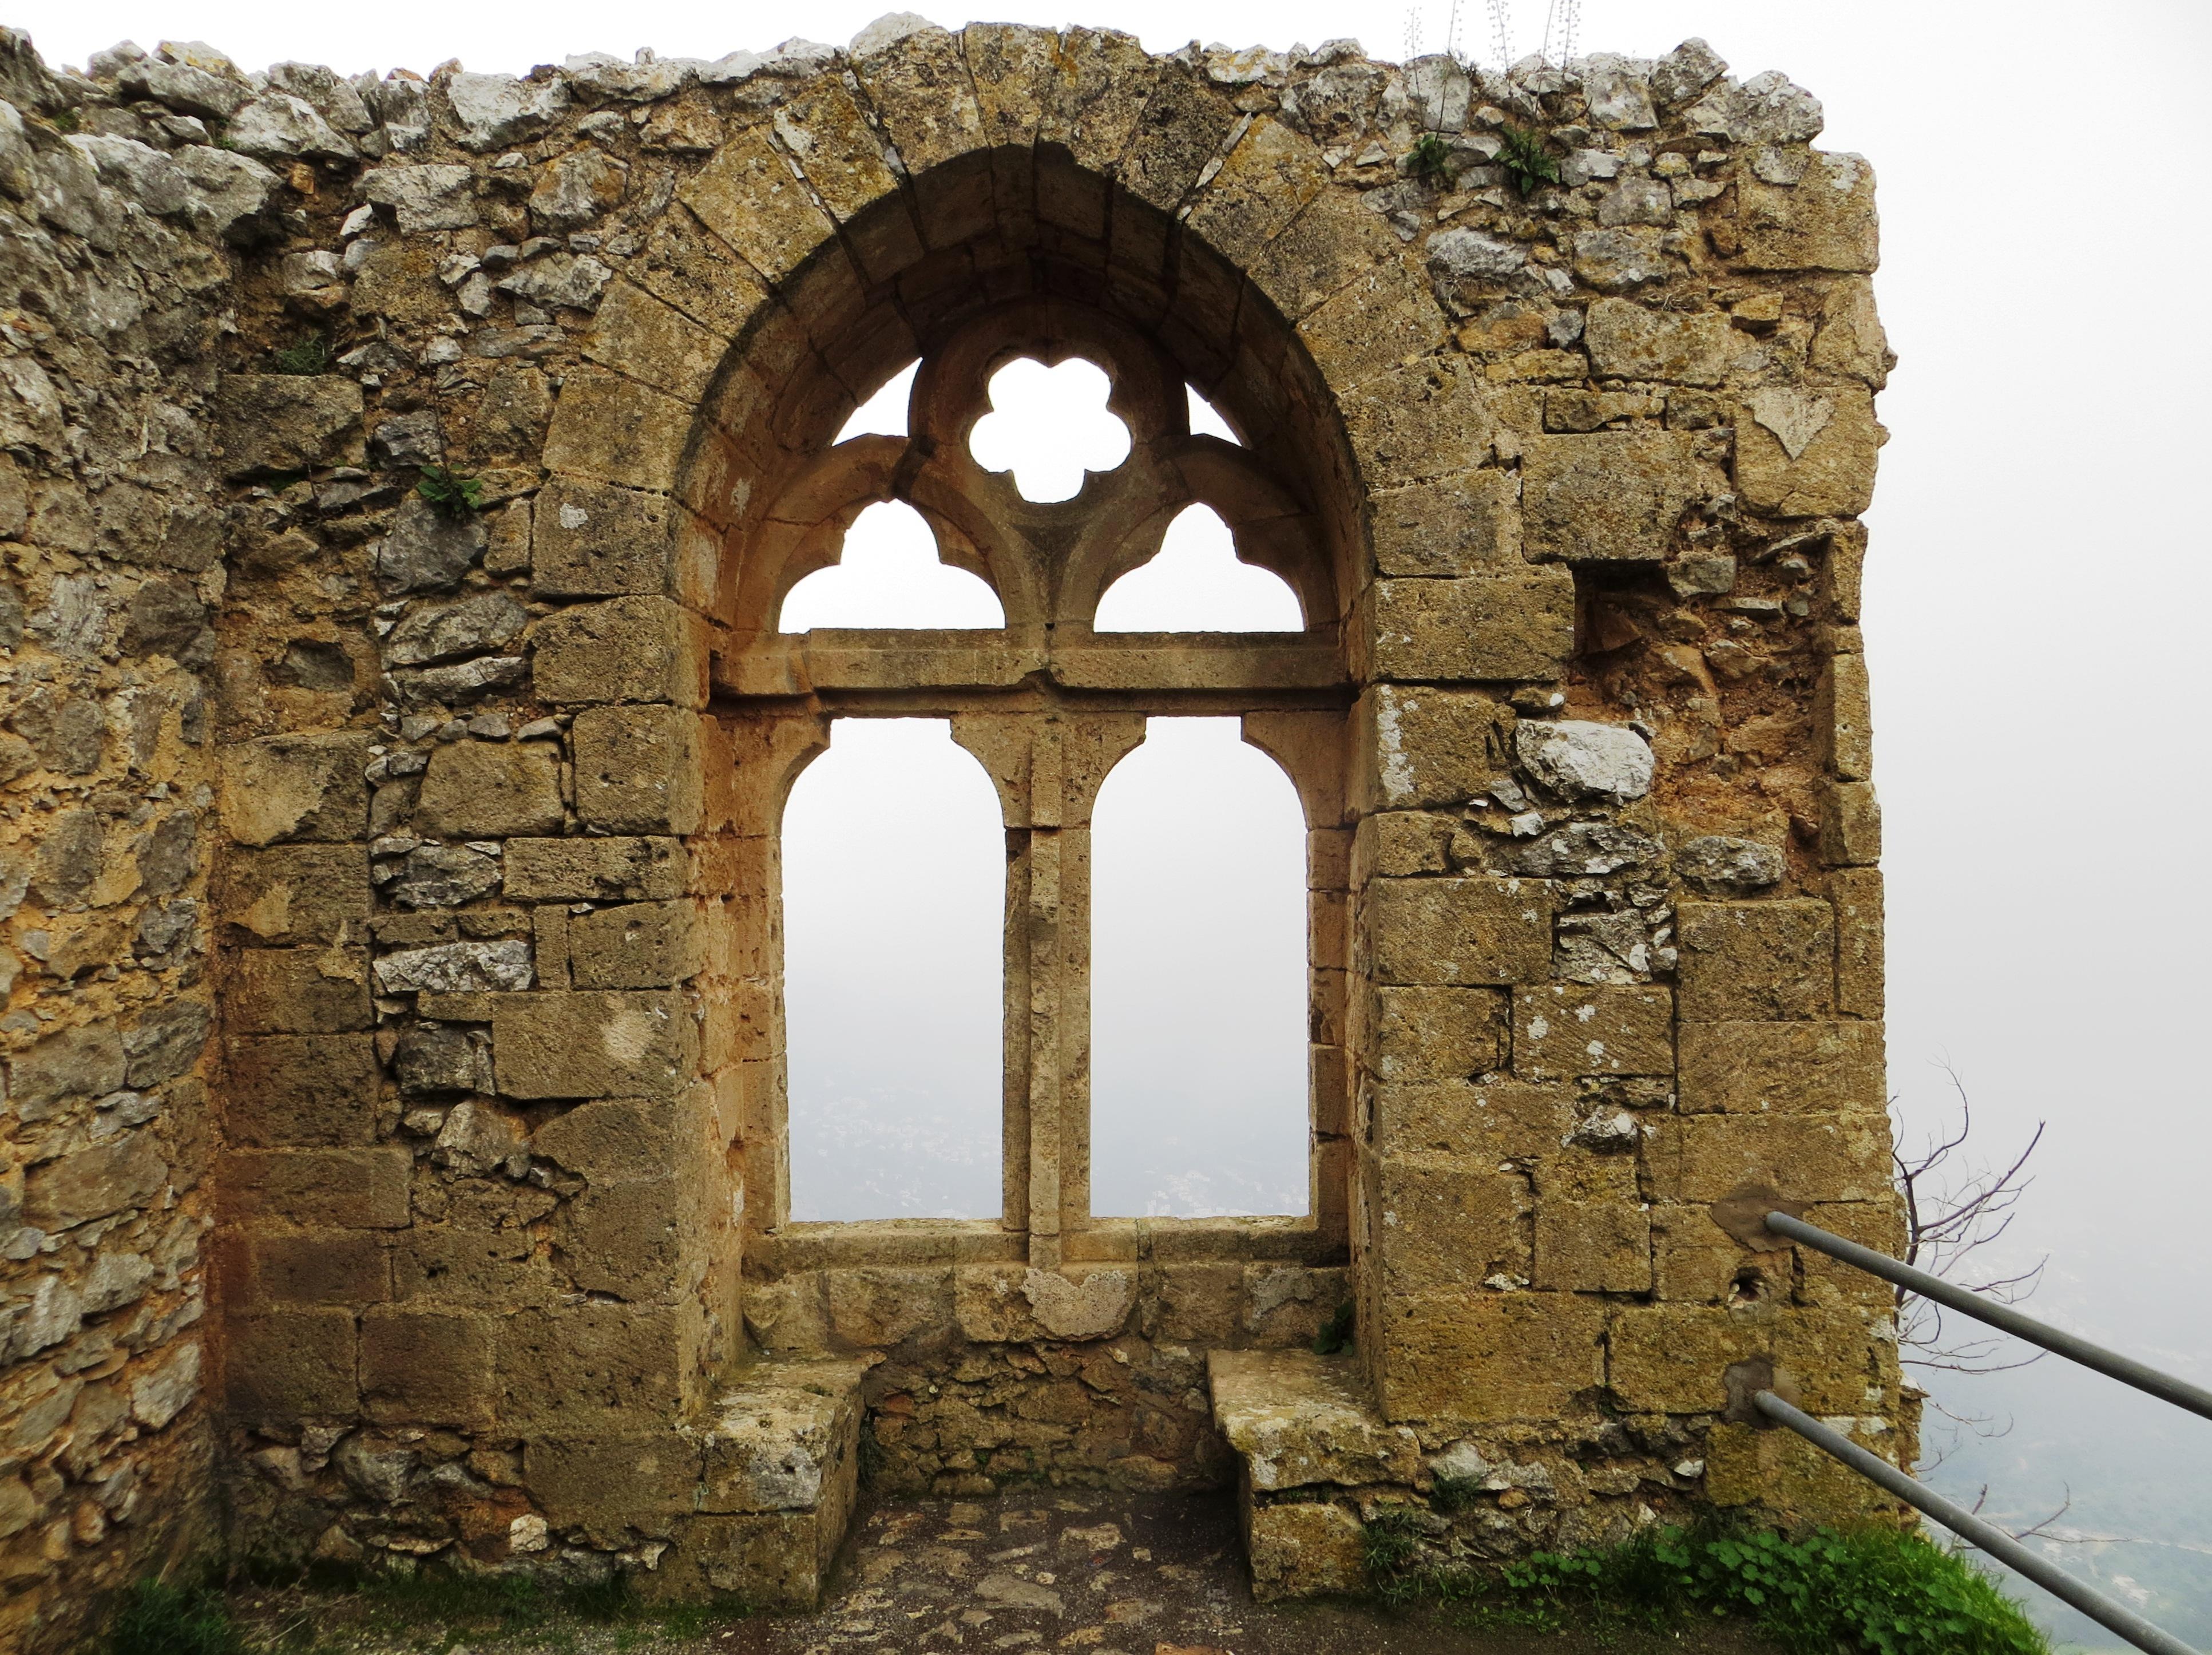 File:Saint Hilarion Castle - Queens window 02.JPG - Wikimedia Commons